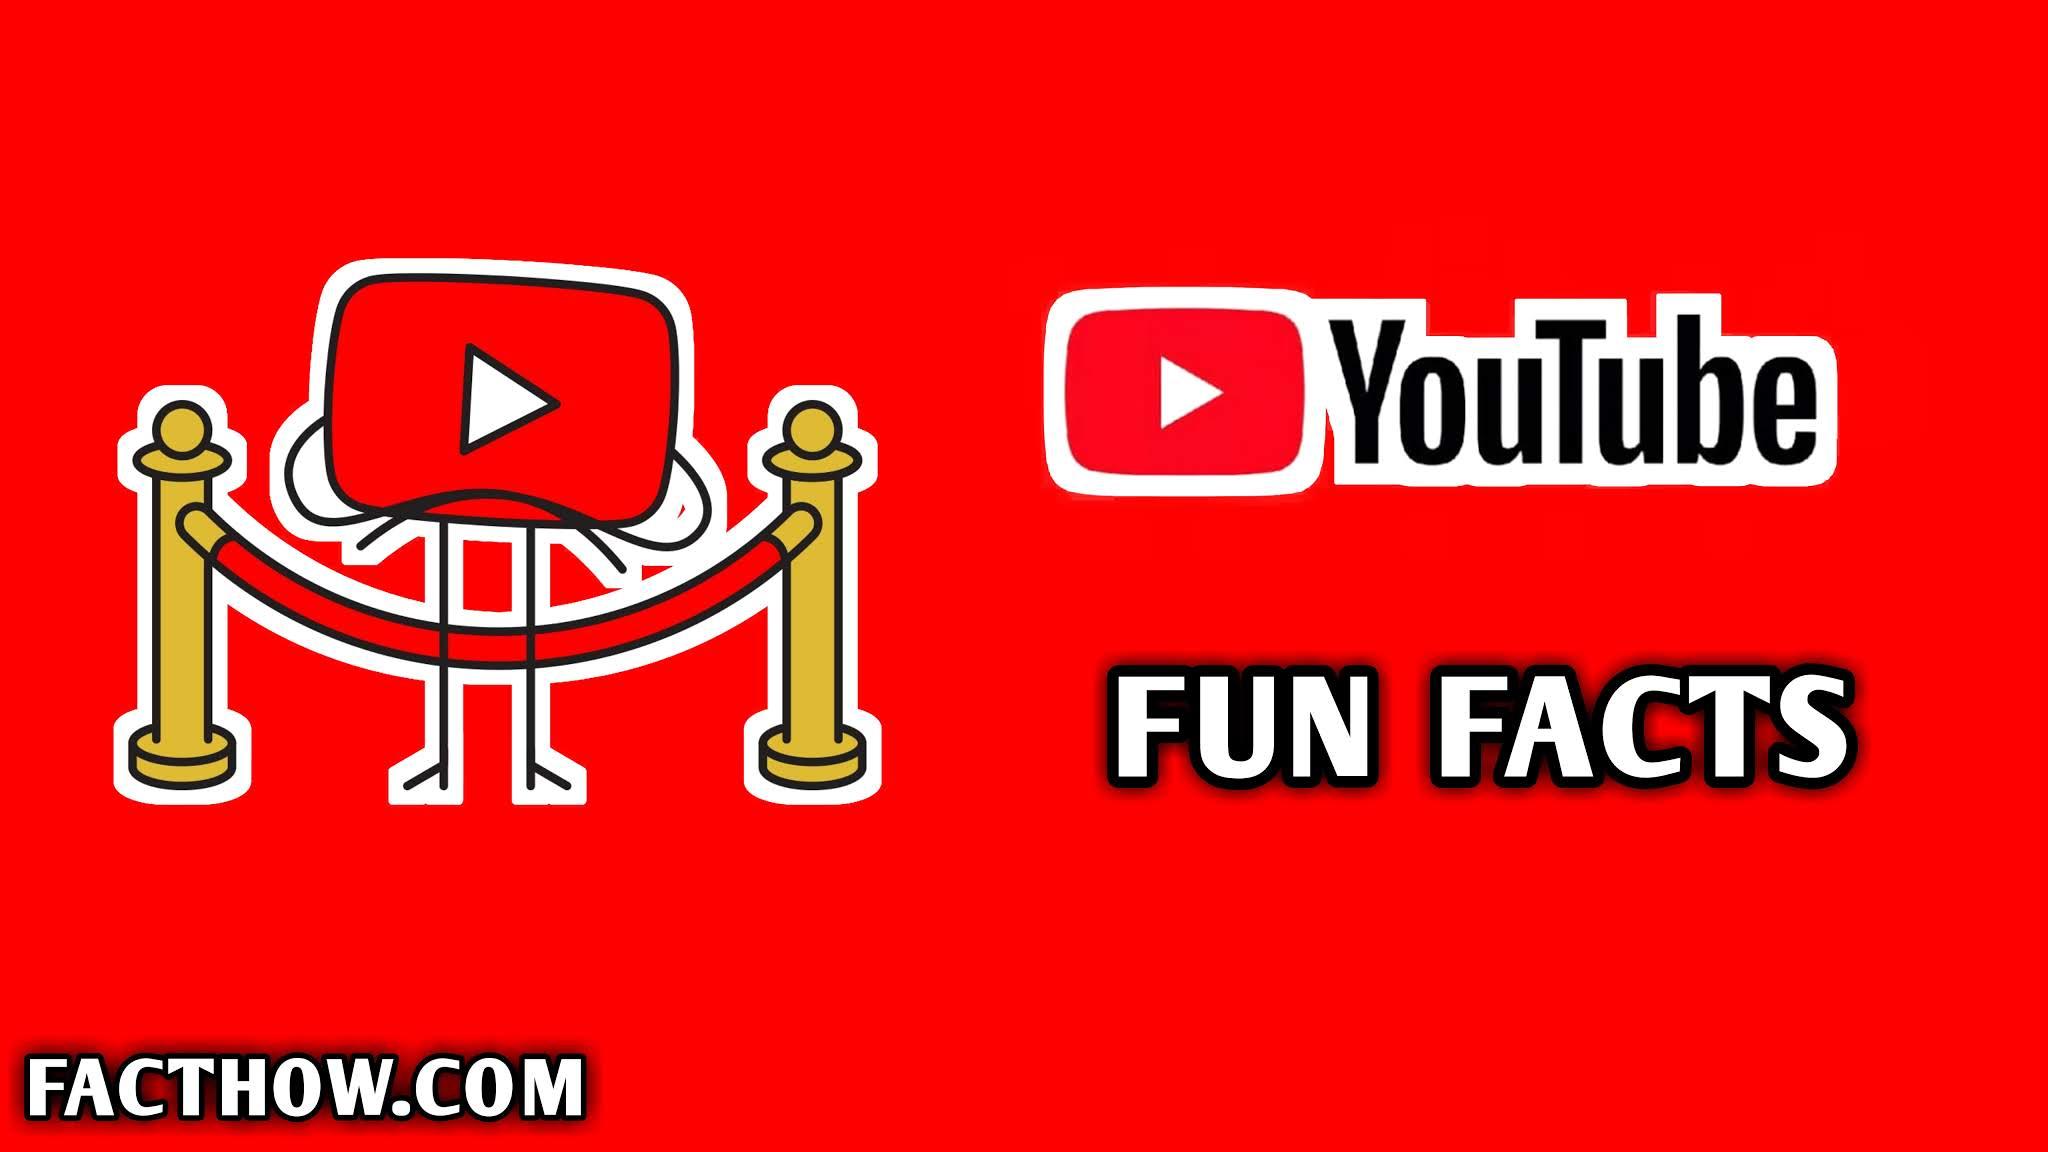 youtube-fun-facts-hindi-interesting-amazing-impressive-youtube-facts-hindi-rochak-tathya-youtube-susan-wojcicki-jawed-karim-me-at-the-zoo-youtube-video-background-play-facthow-fact-how-youtube-rochak-jaankari-youtube-world-records-t-series